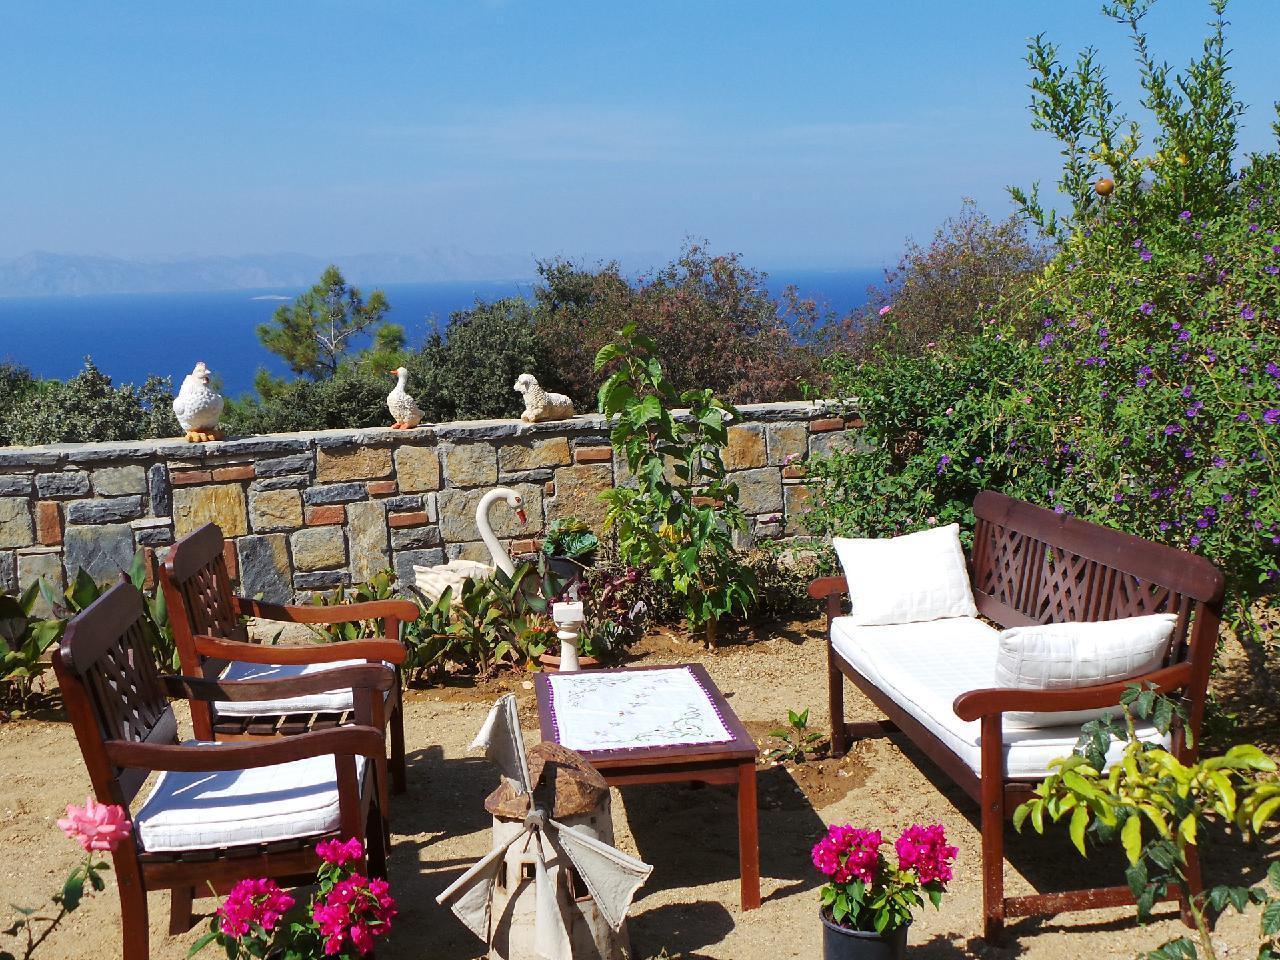 Ferienhaus VILLA DELPHIN - BODRUM GÜMÜSLÜK - Mit Märchenhaftem Natur und Meerblick (502386), Koyunbaba, , Ägäisregion, Türkei, Bild 34